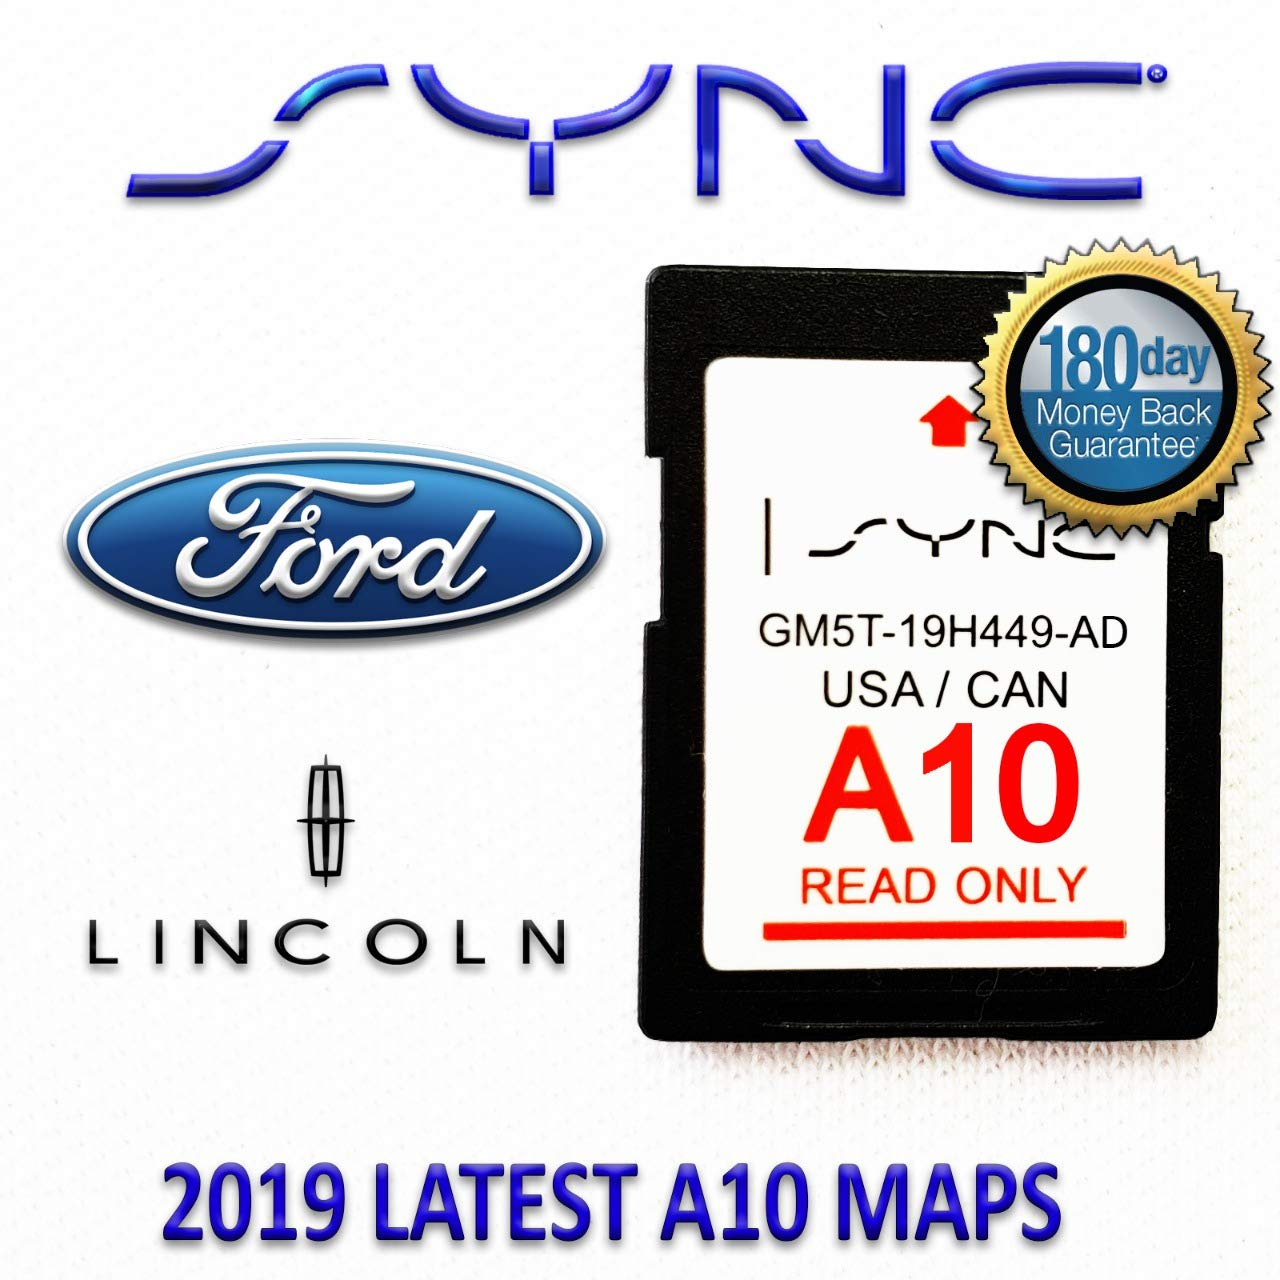 Ford Lincoln A10 Navigation SD Card USA/Canada by TeleNav